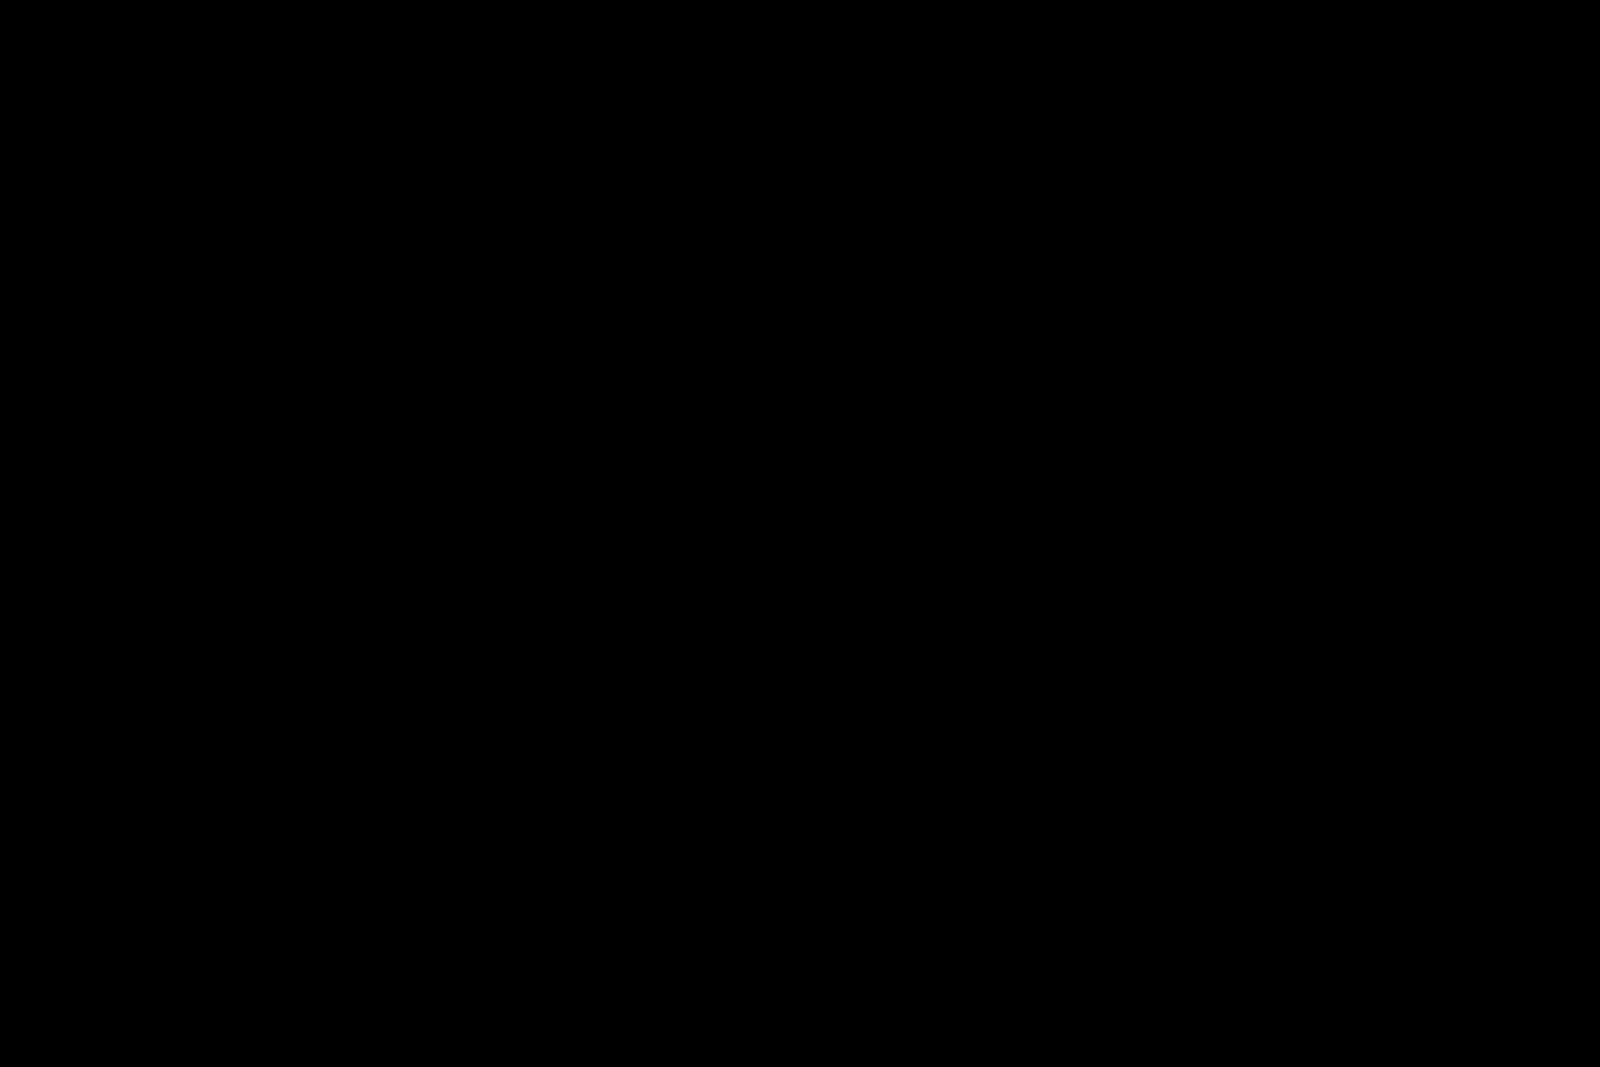 Nye konverteringstabeller